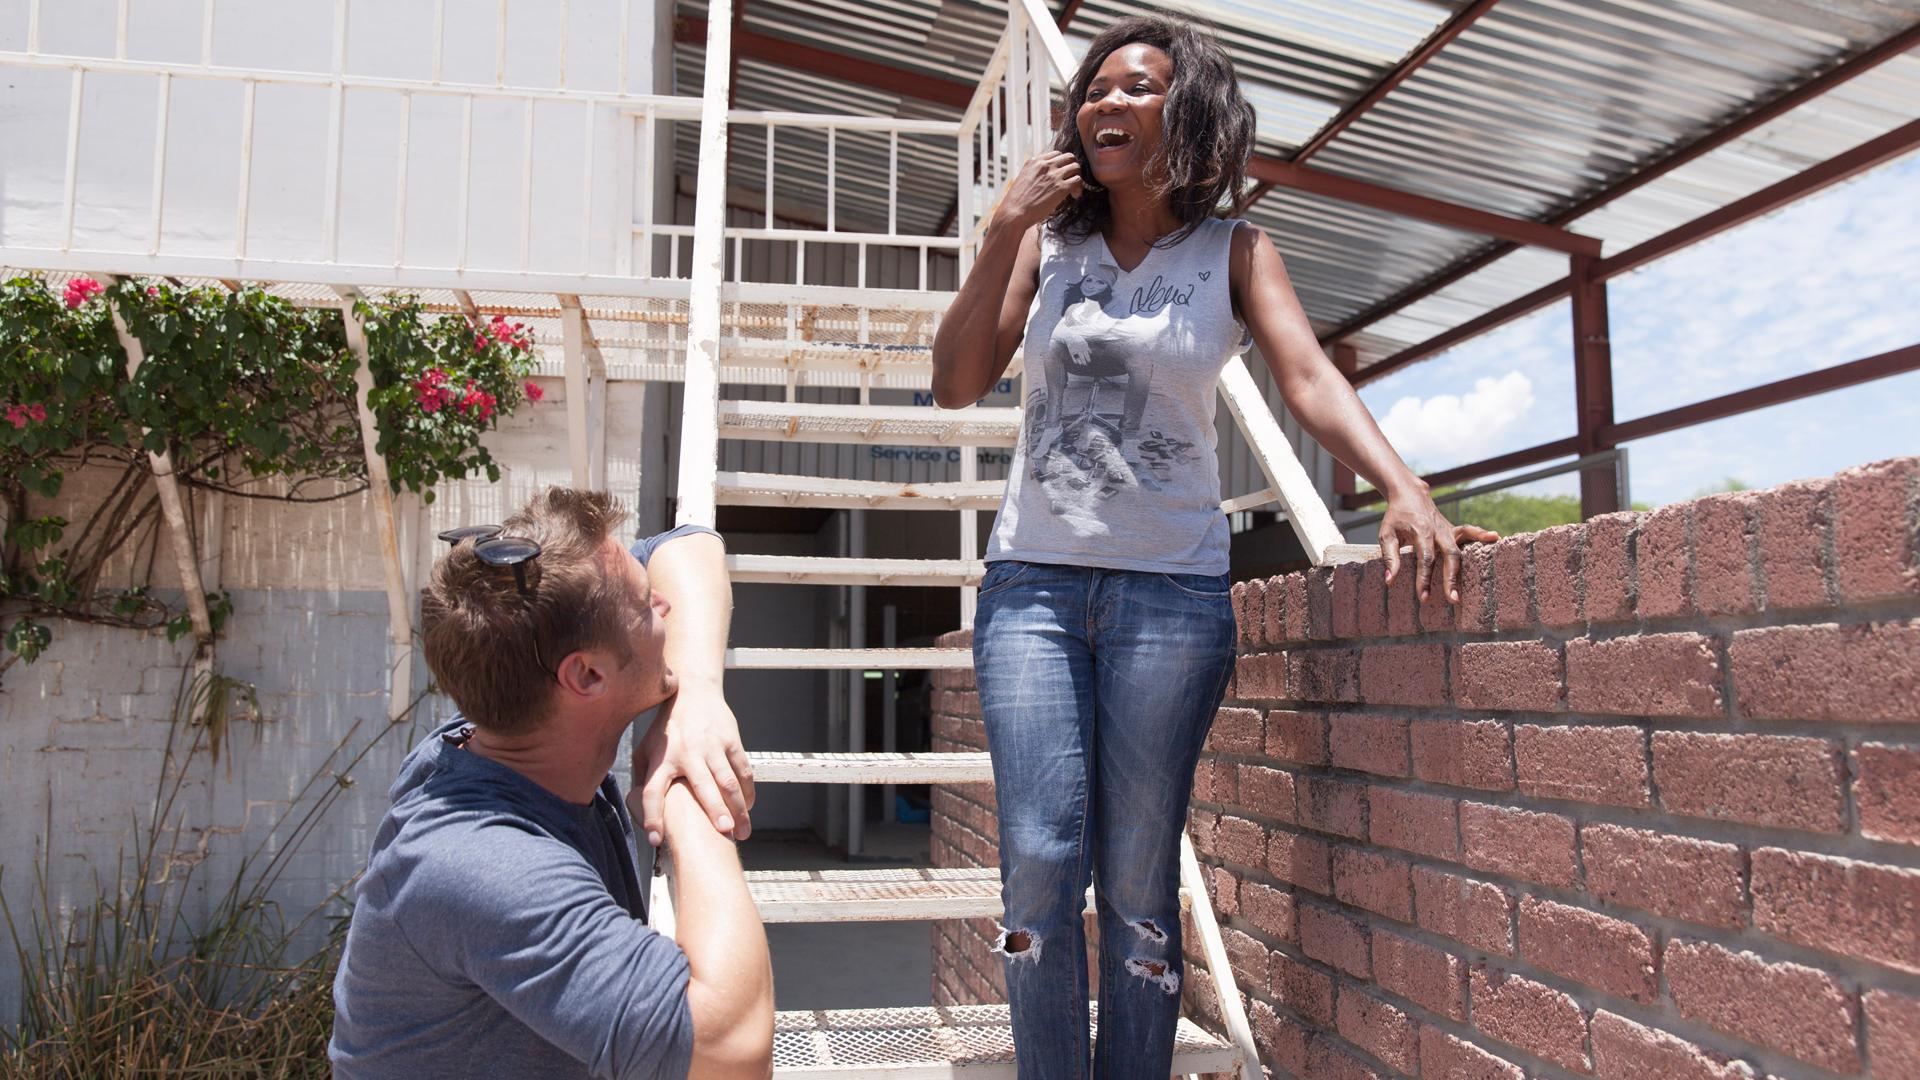 Arte Documentary - Queens of Botswana - Making of Image 5